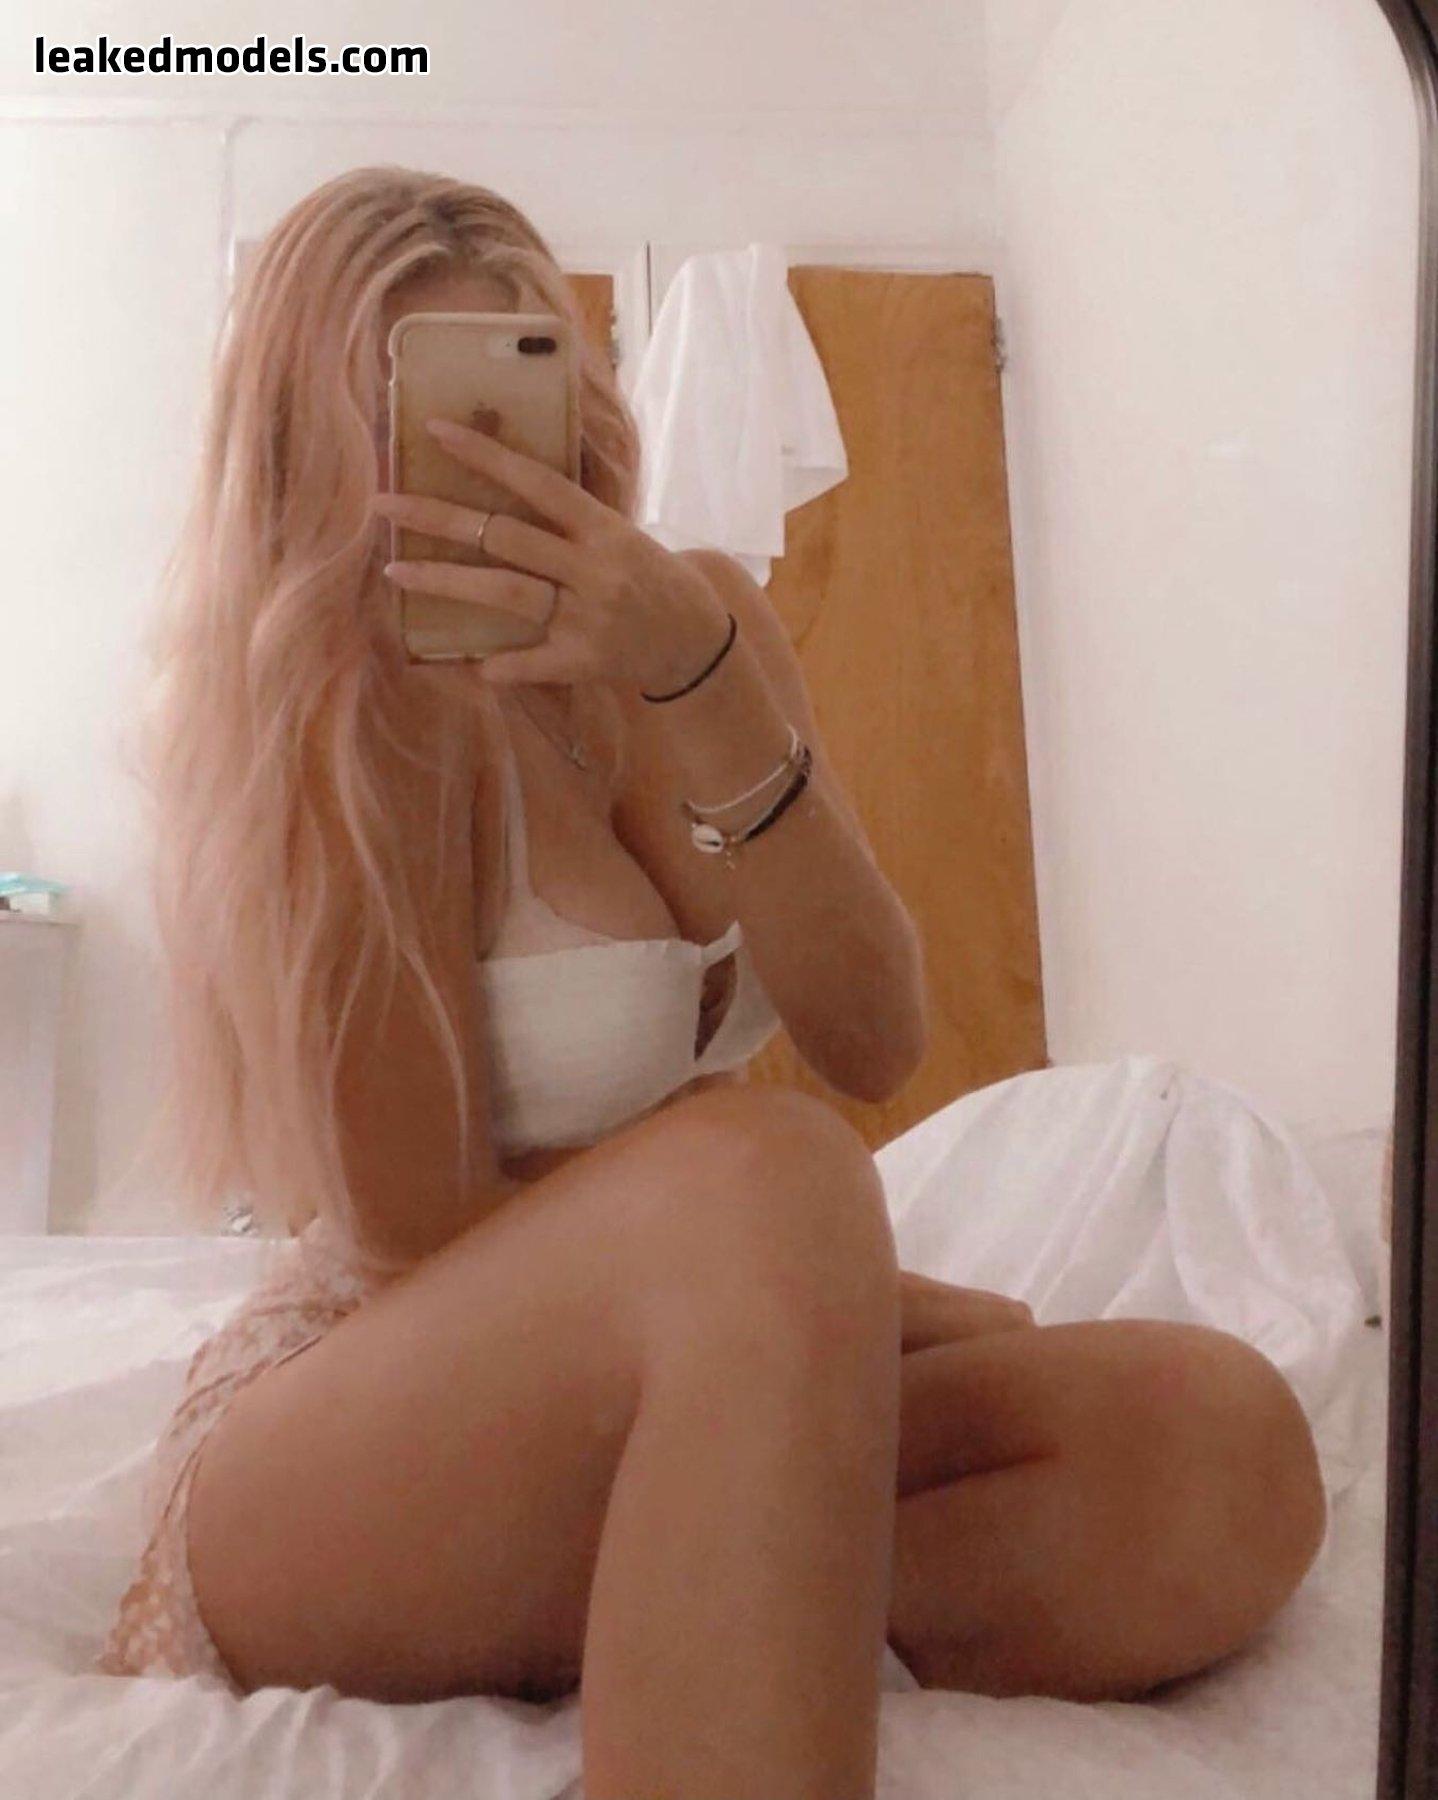 Vanessa – vansessy OnlyFans Nude Leaks (25 Photos)